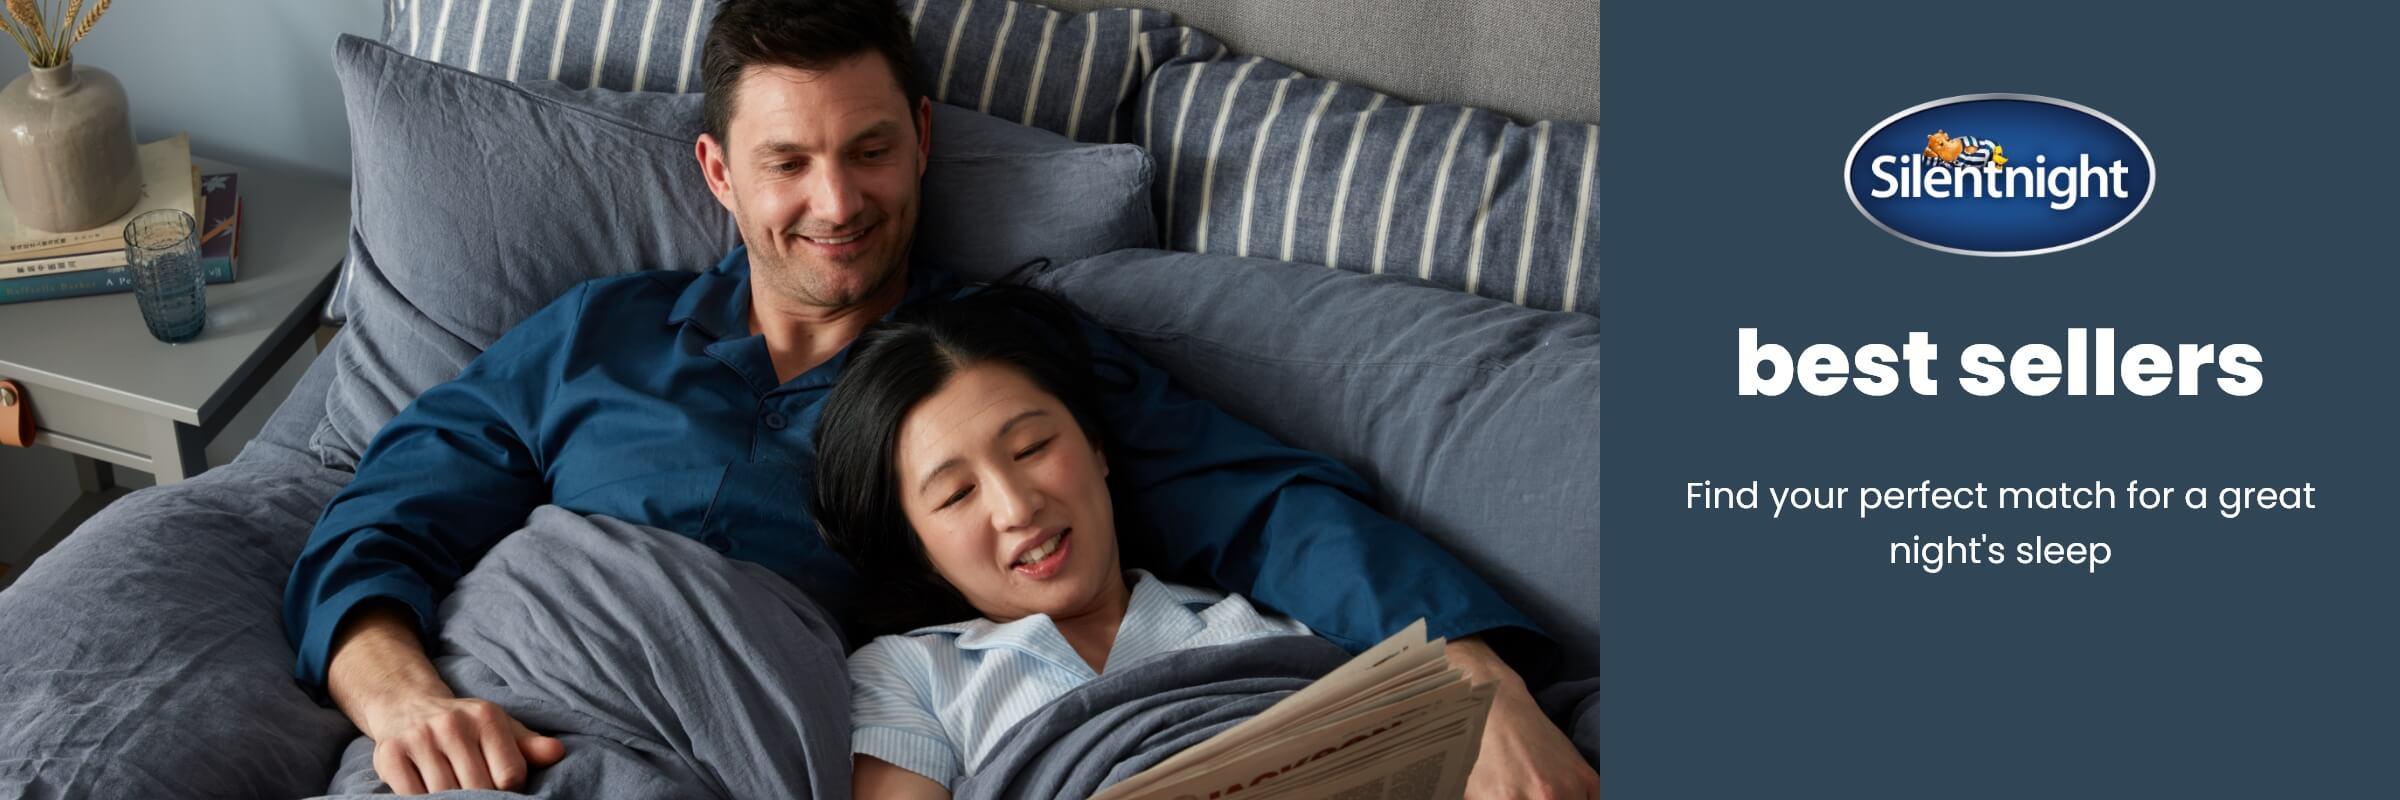 Best-selling mattresses from Silentnight